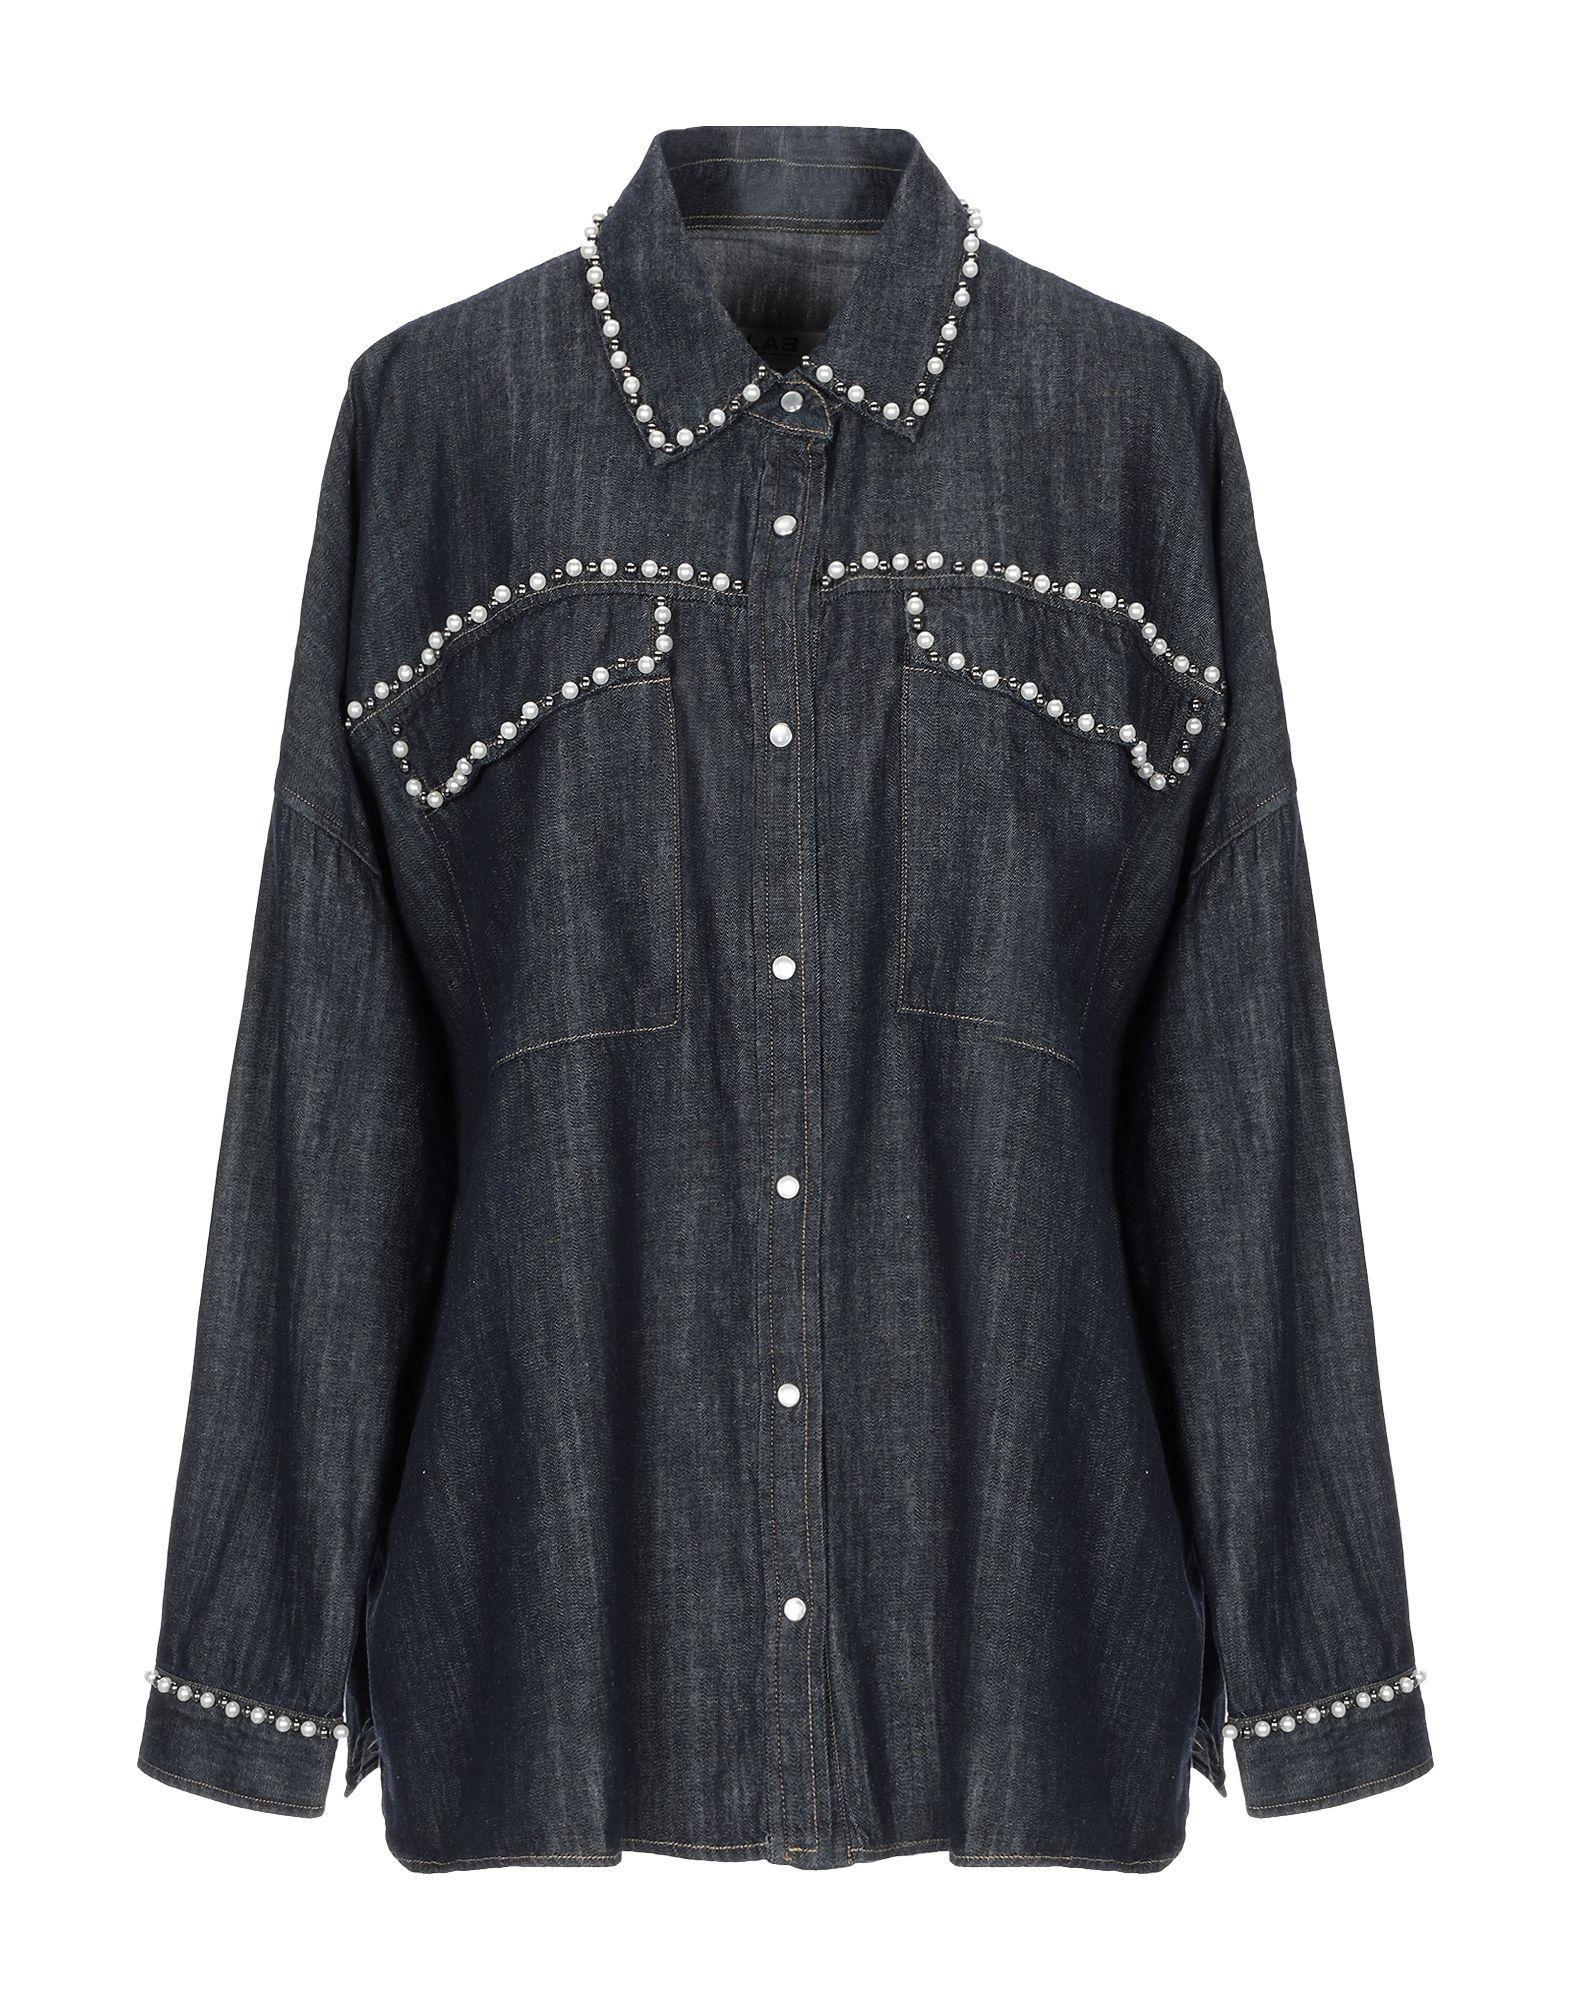 LAB ANNA RACHELE Джинсовая рубашка рубашка oodji lab